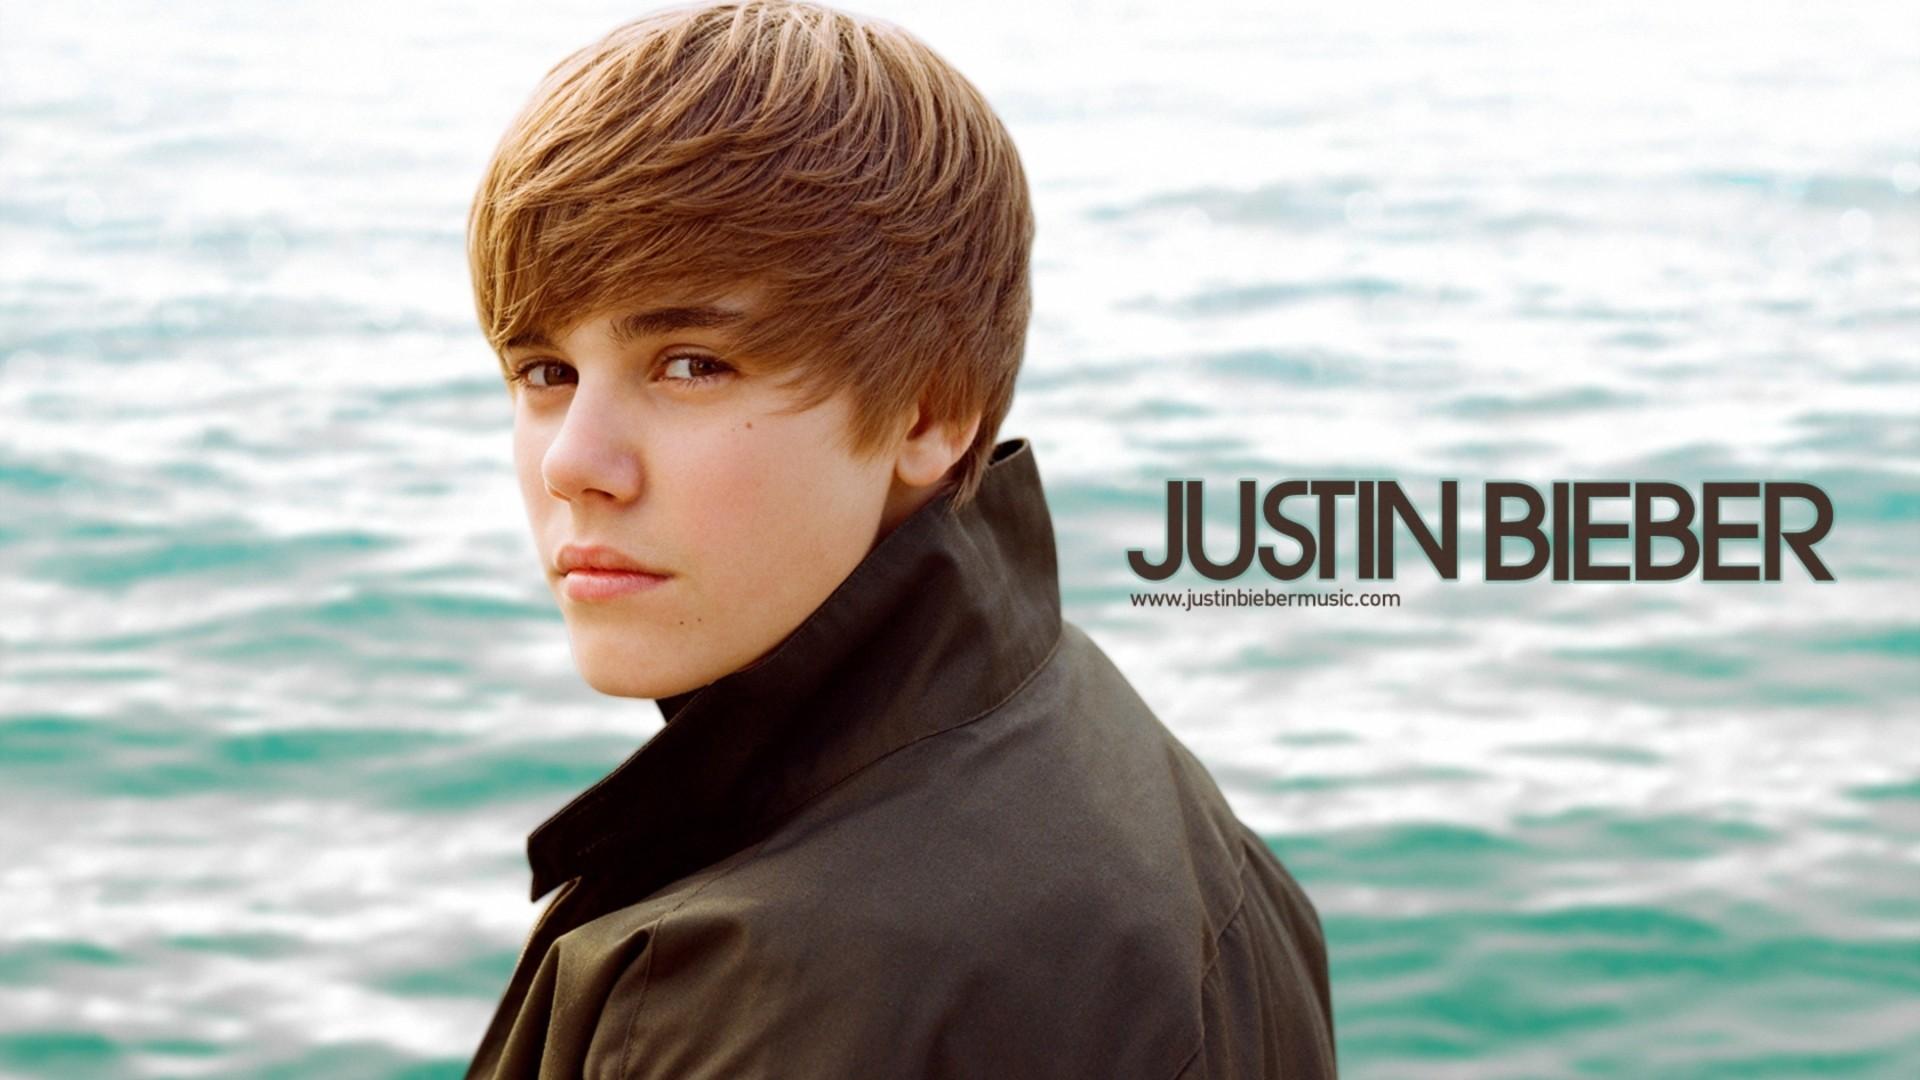 Justin Bieber HD Wallpaper (64+ Images